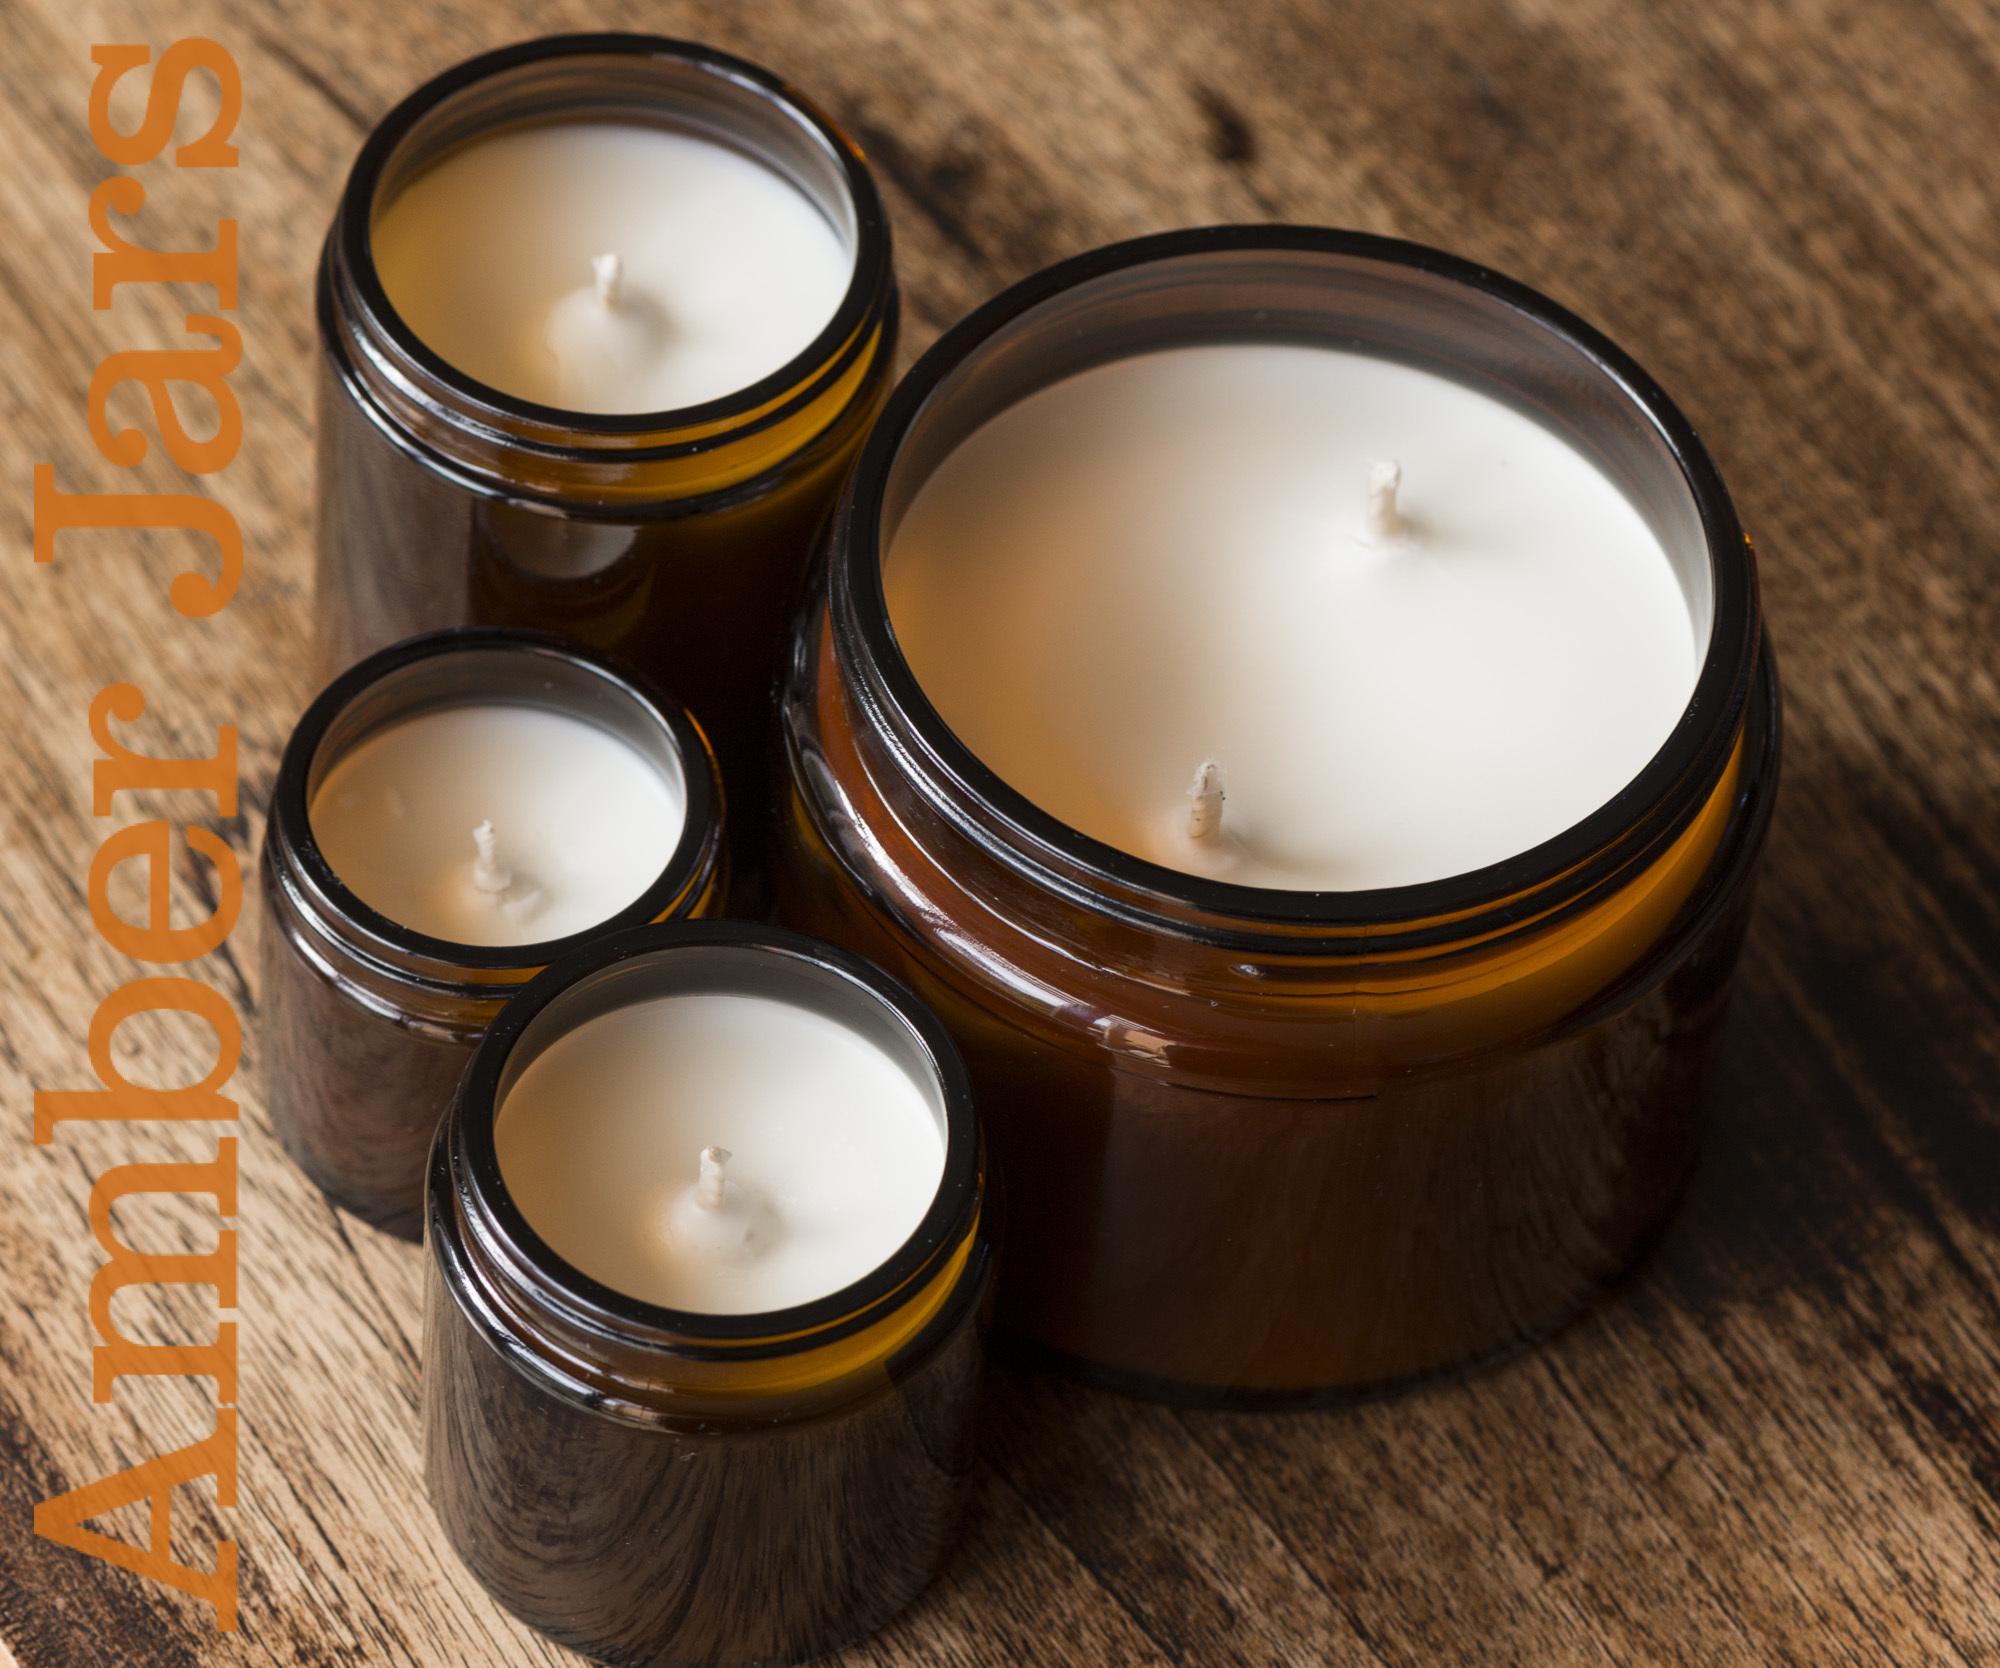 120ml Amber Glass Cream Jar With Smooth Black Wadded